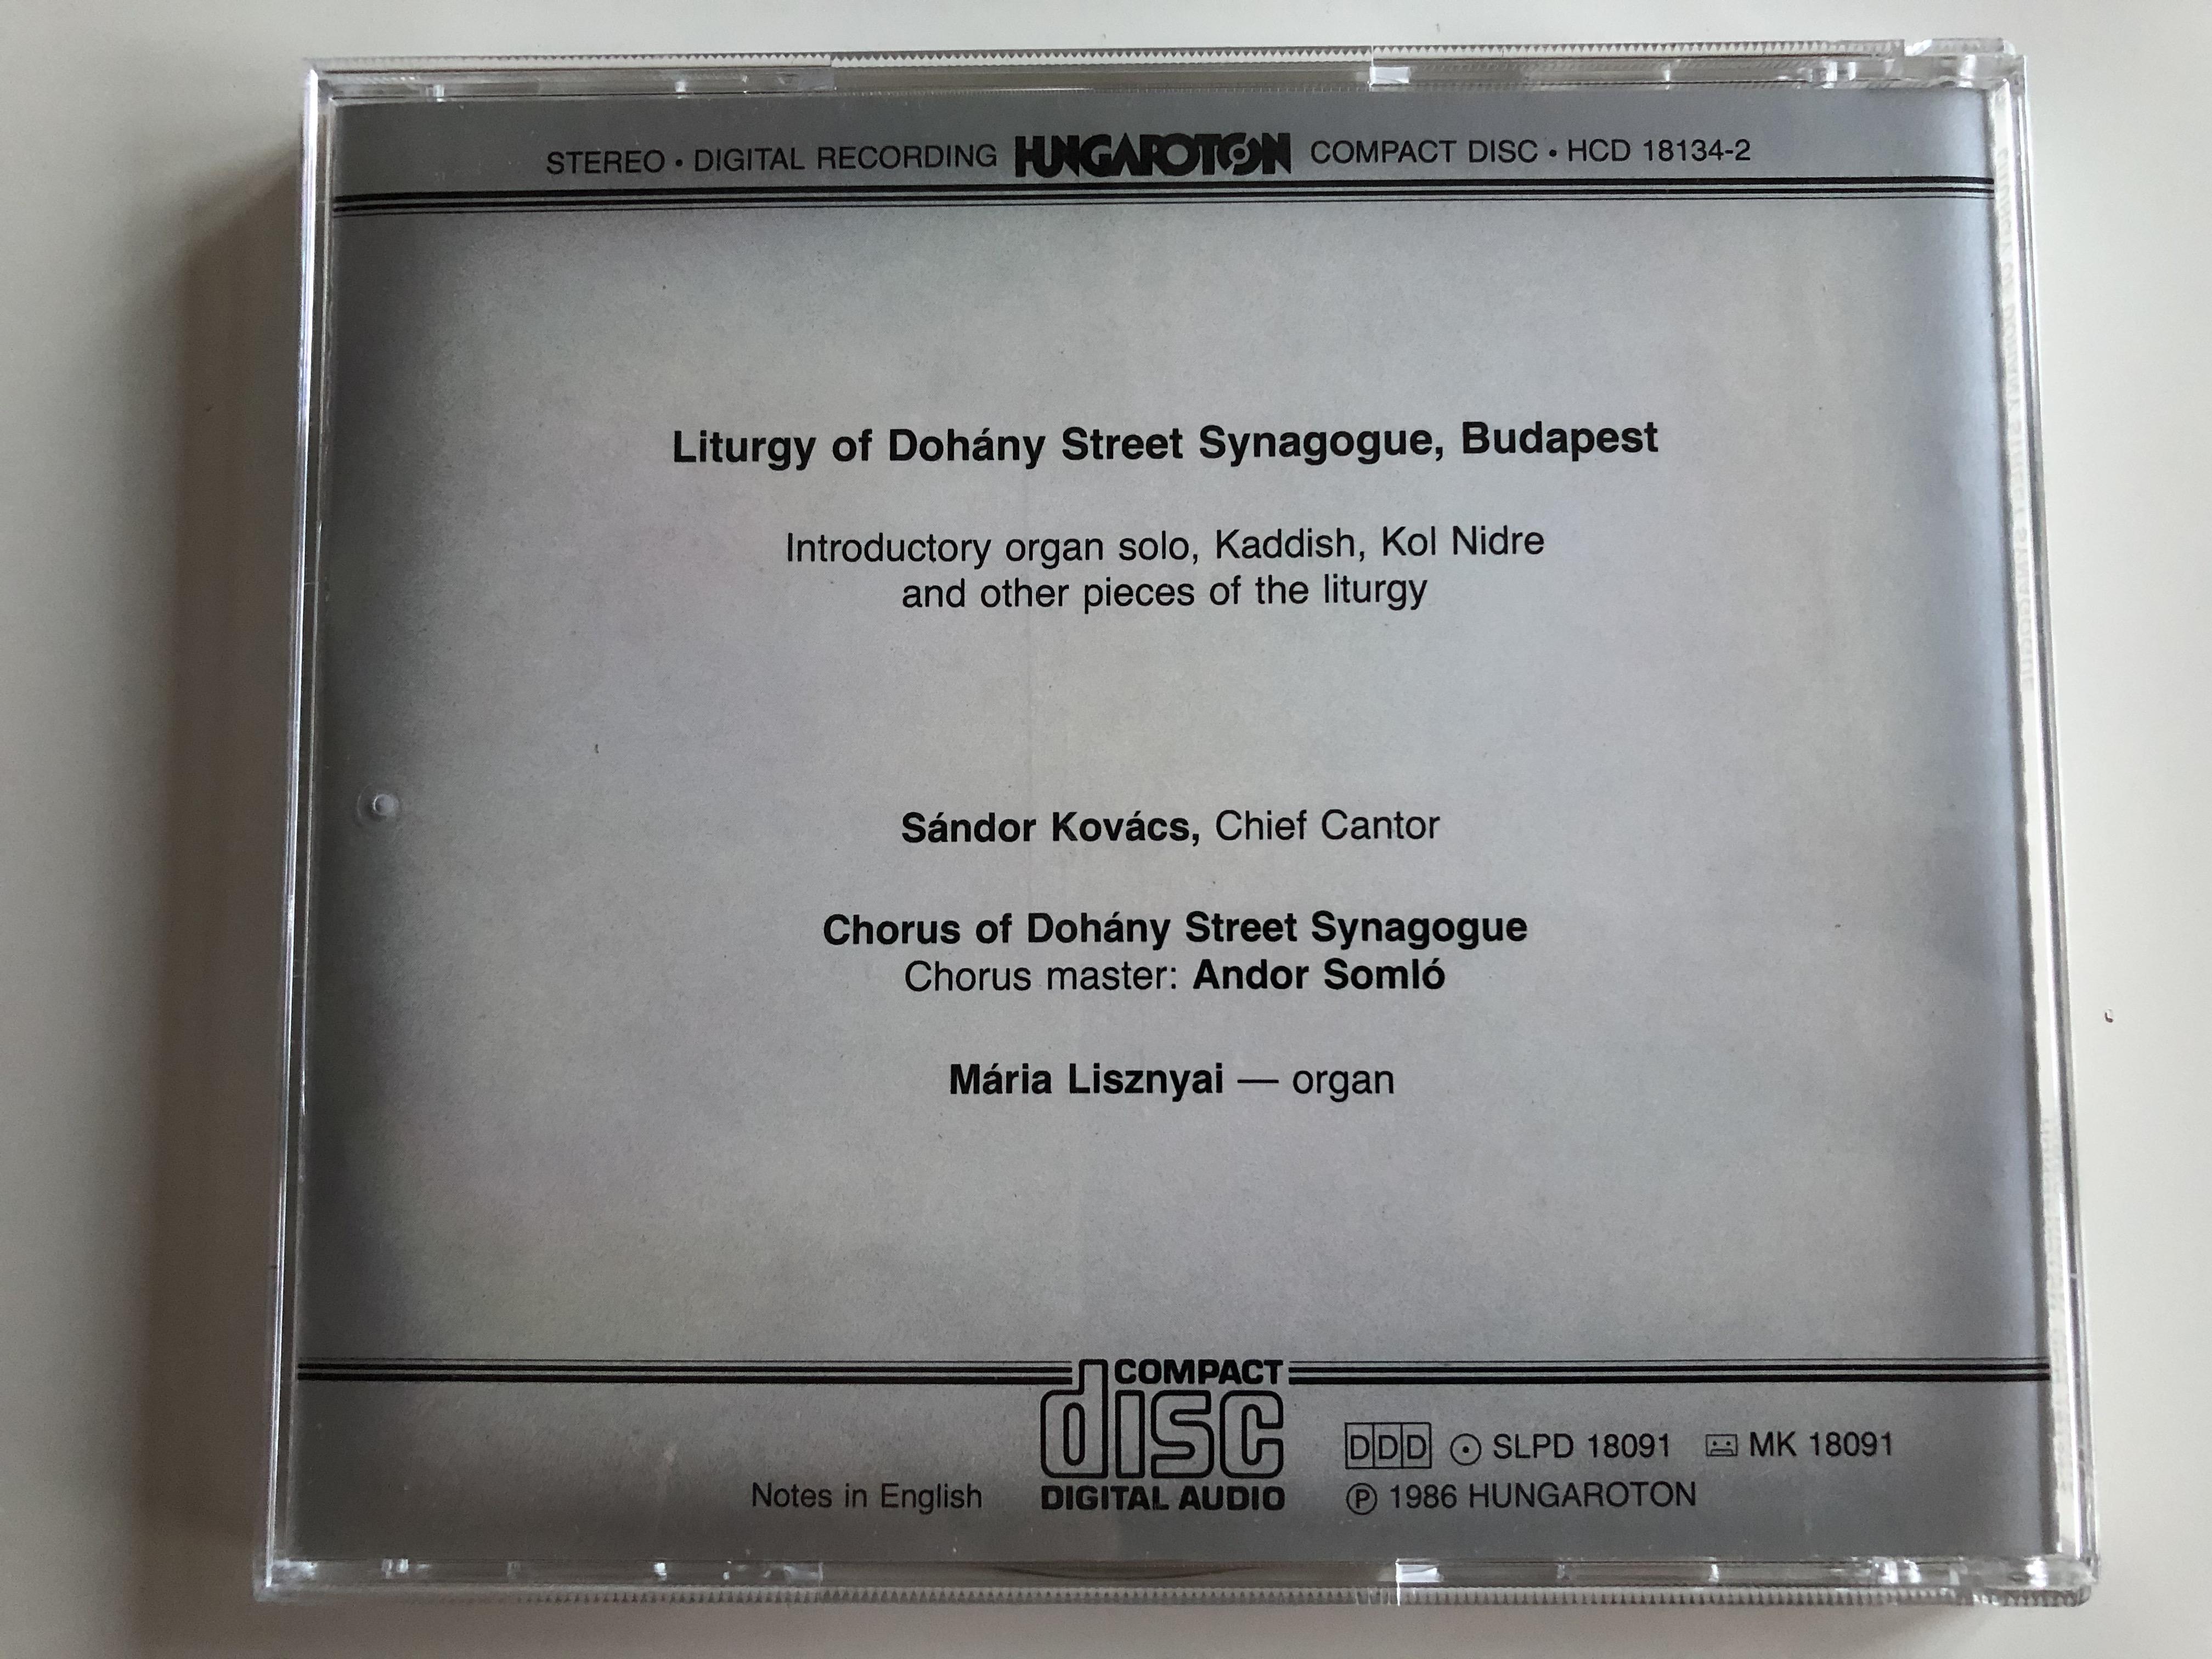 liturgy-of-doh-ny-street-synagogue-s-ndor-kov-cs-chief-cantor-hungaroton-audio-cd-1986-stereo-hcd-18134-2-7-.jpg